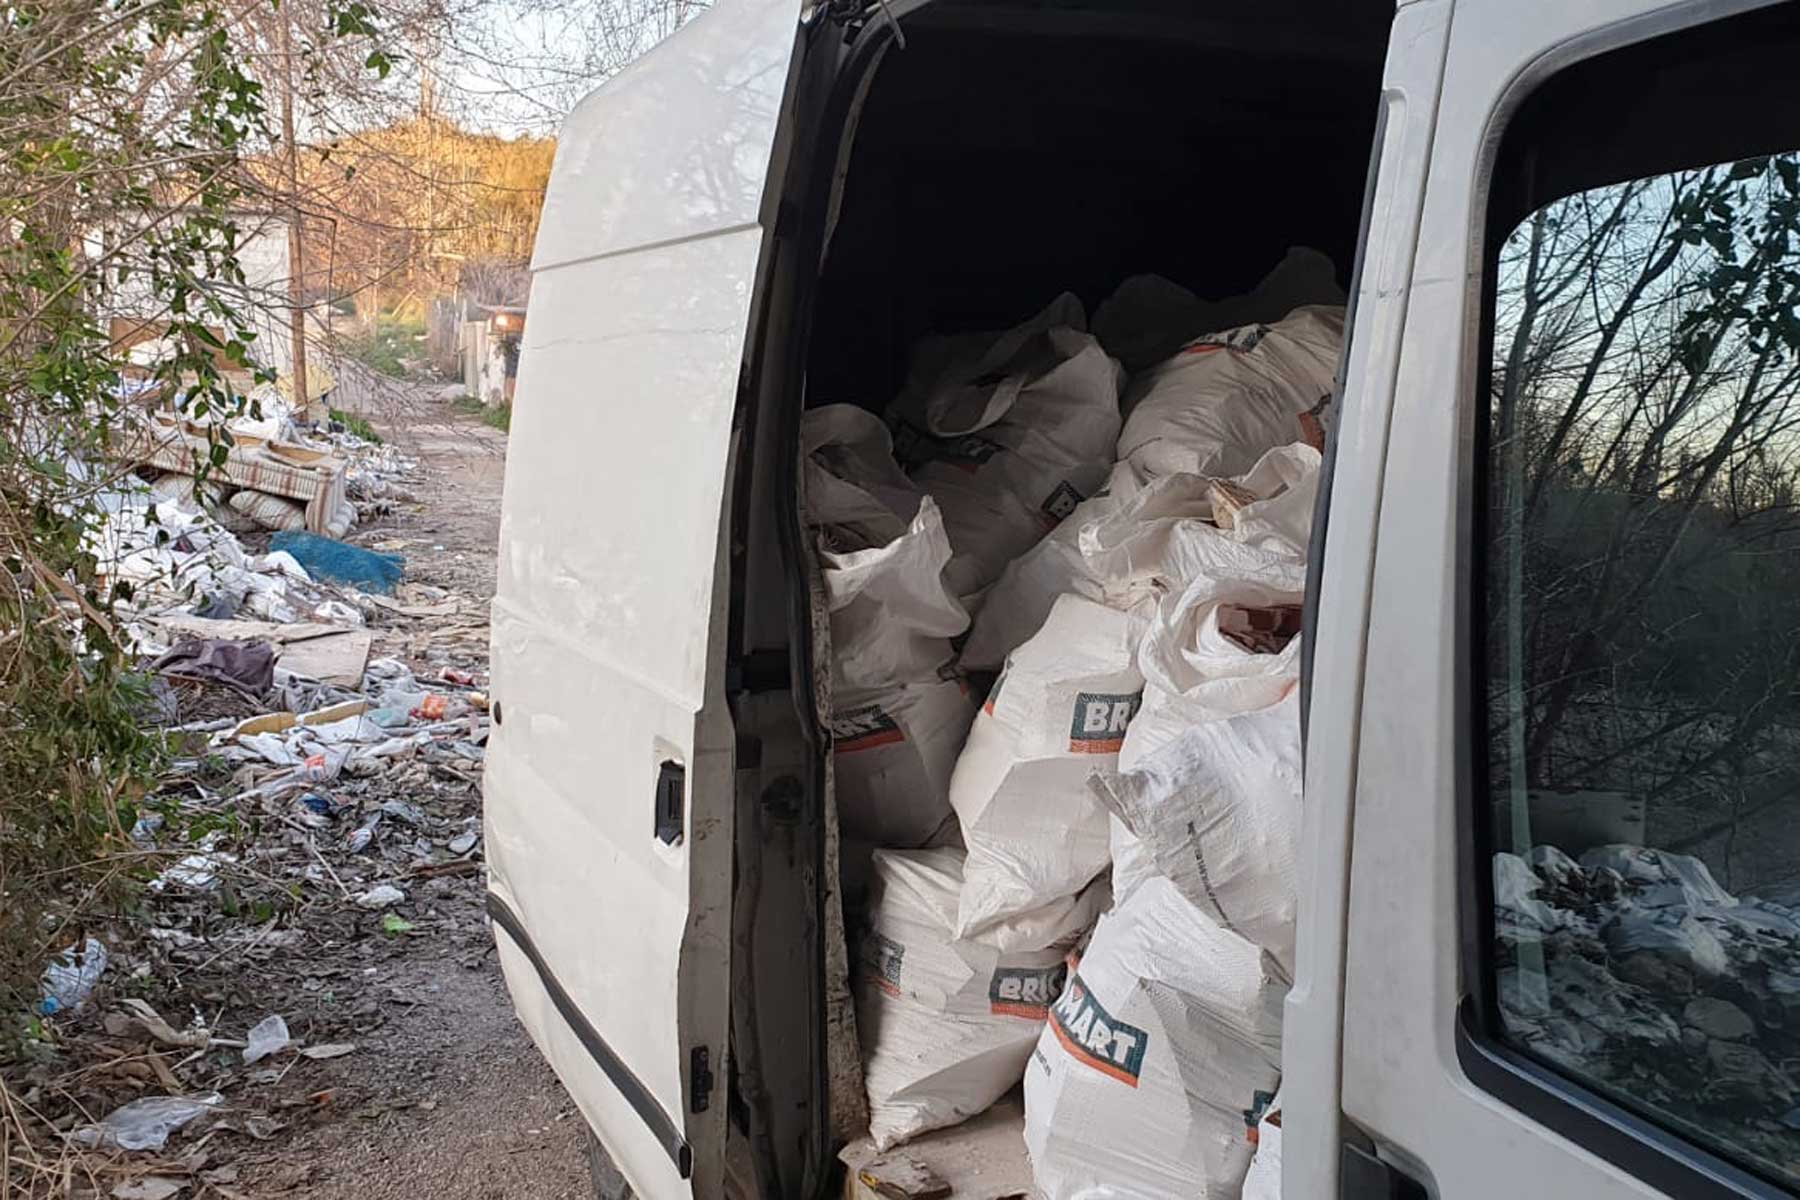 Efectivos de Móstoles consiguen interceptar a un individuo que pretendía arrojar 25 sacos de residuos sólidos de obra